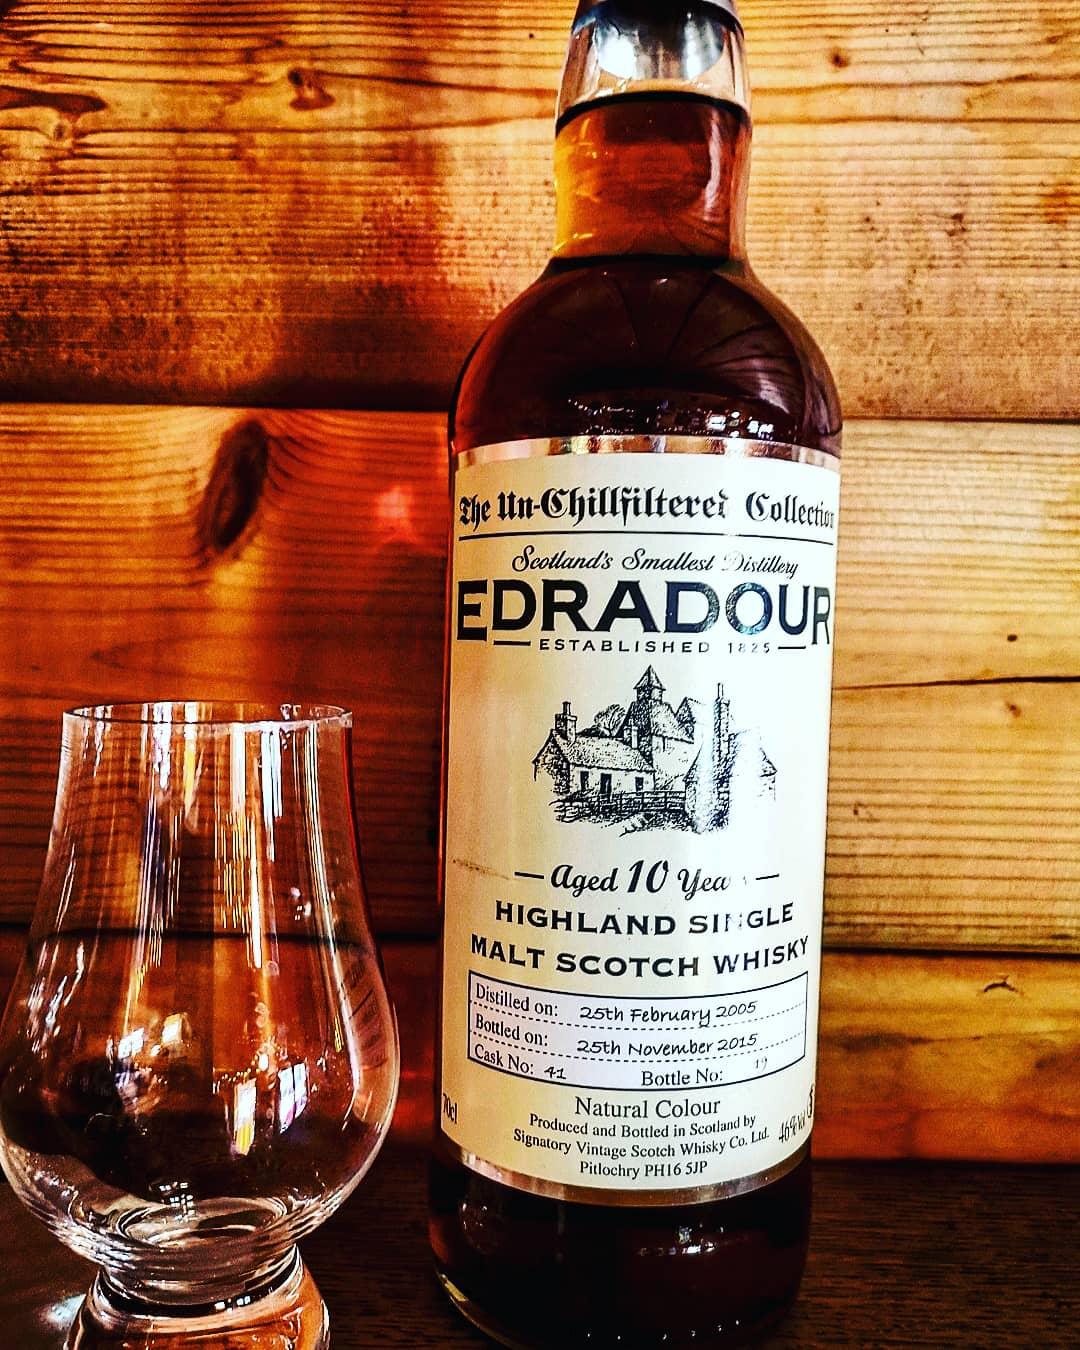 Edradour 10 Jahre Signatory Vintage Highland Single Malt Scotch Whisky